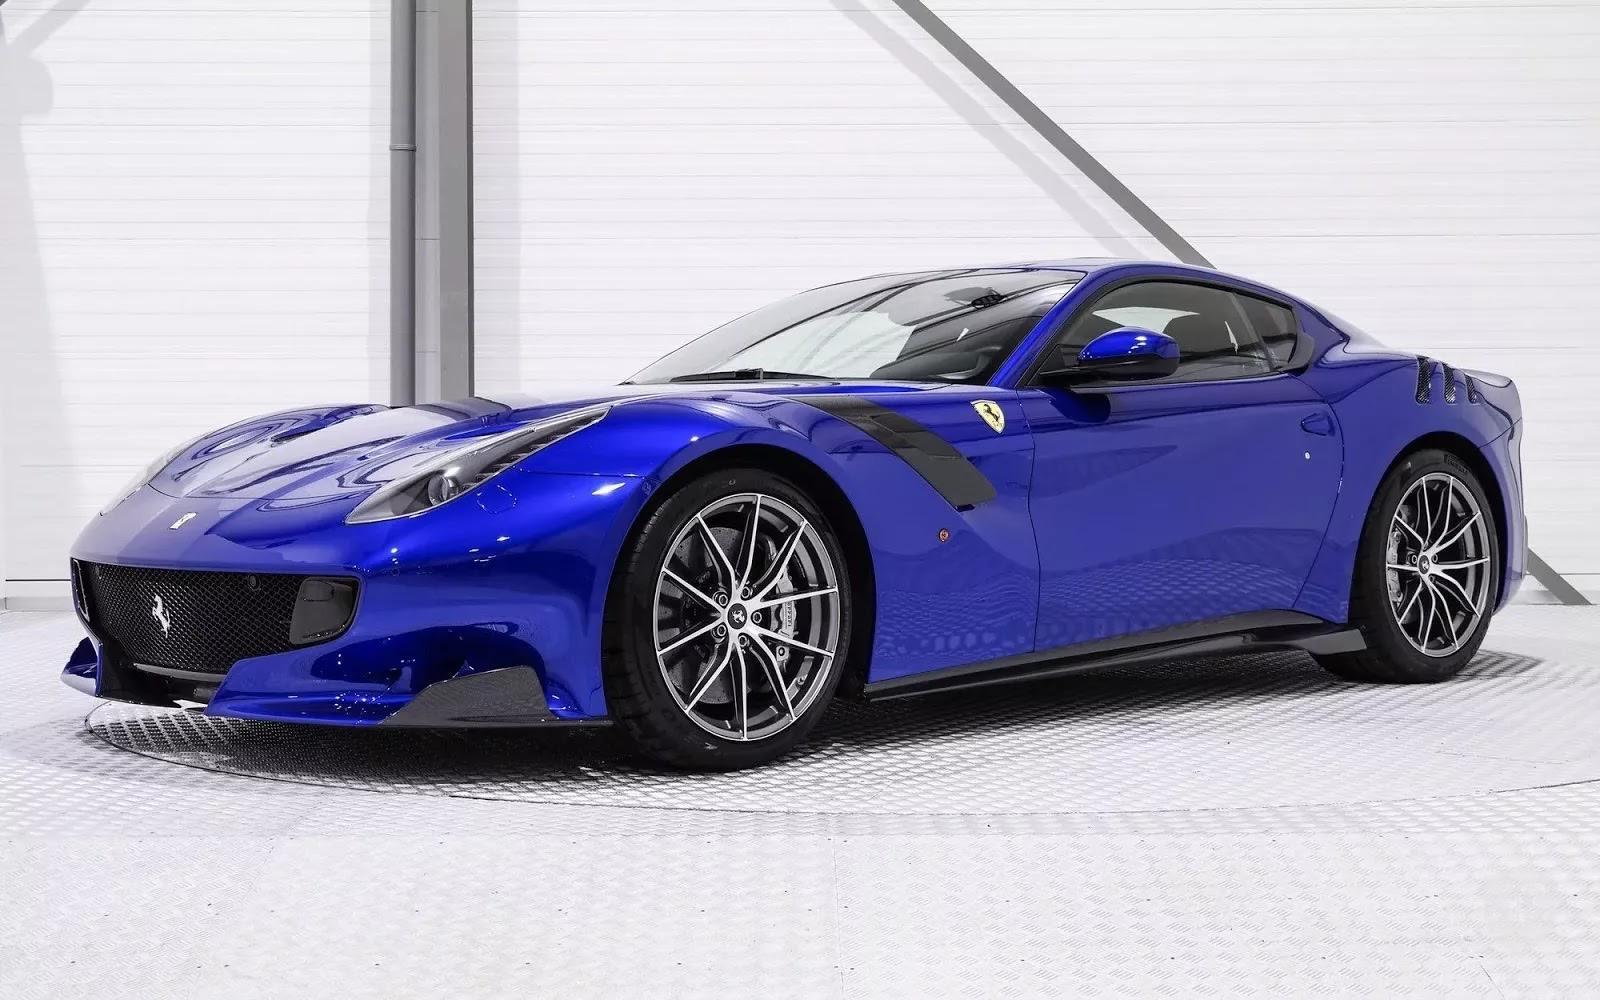 One-Off_Electric_Blue_Ferrari_F12tdf_01